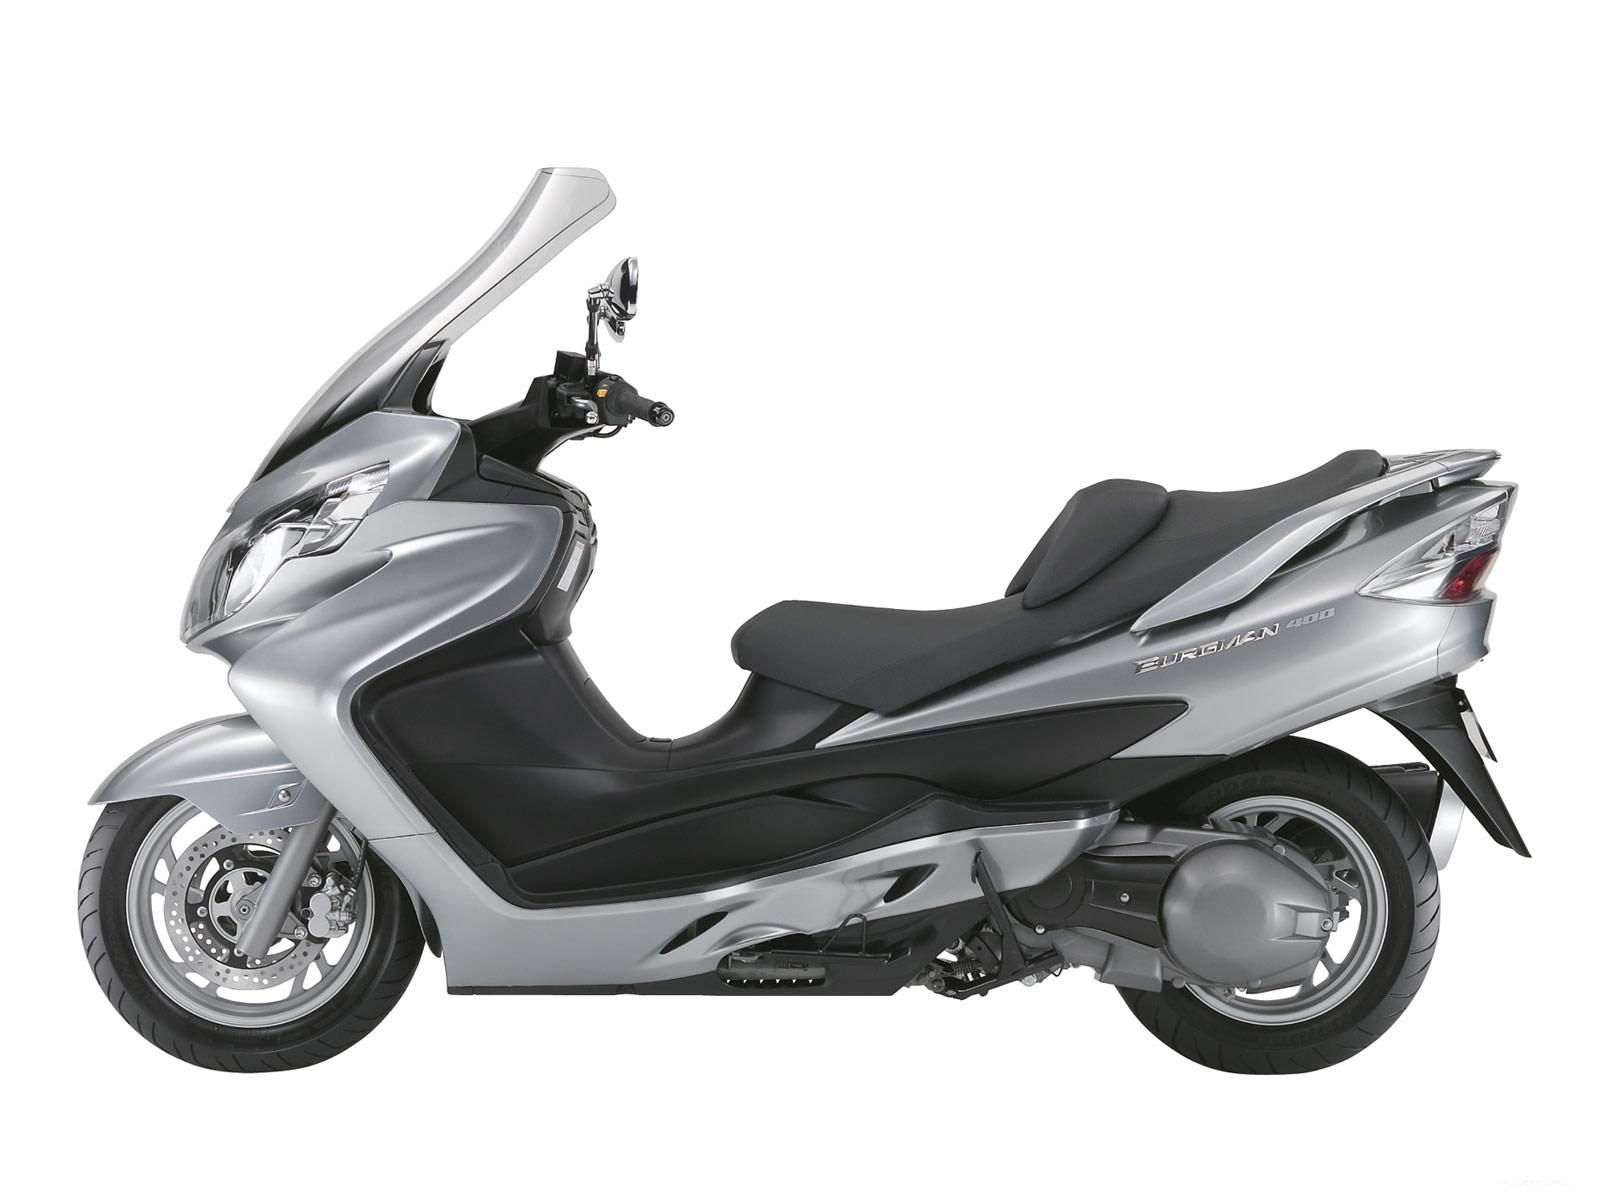 2007 Suzuki Burgman 400 Scooter Pictures Insurance